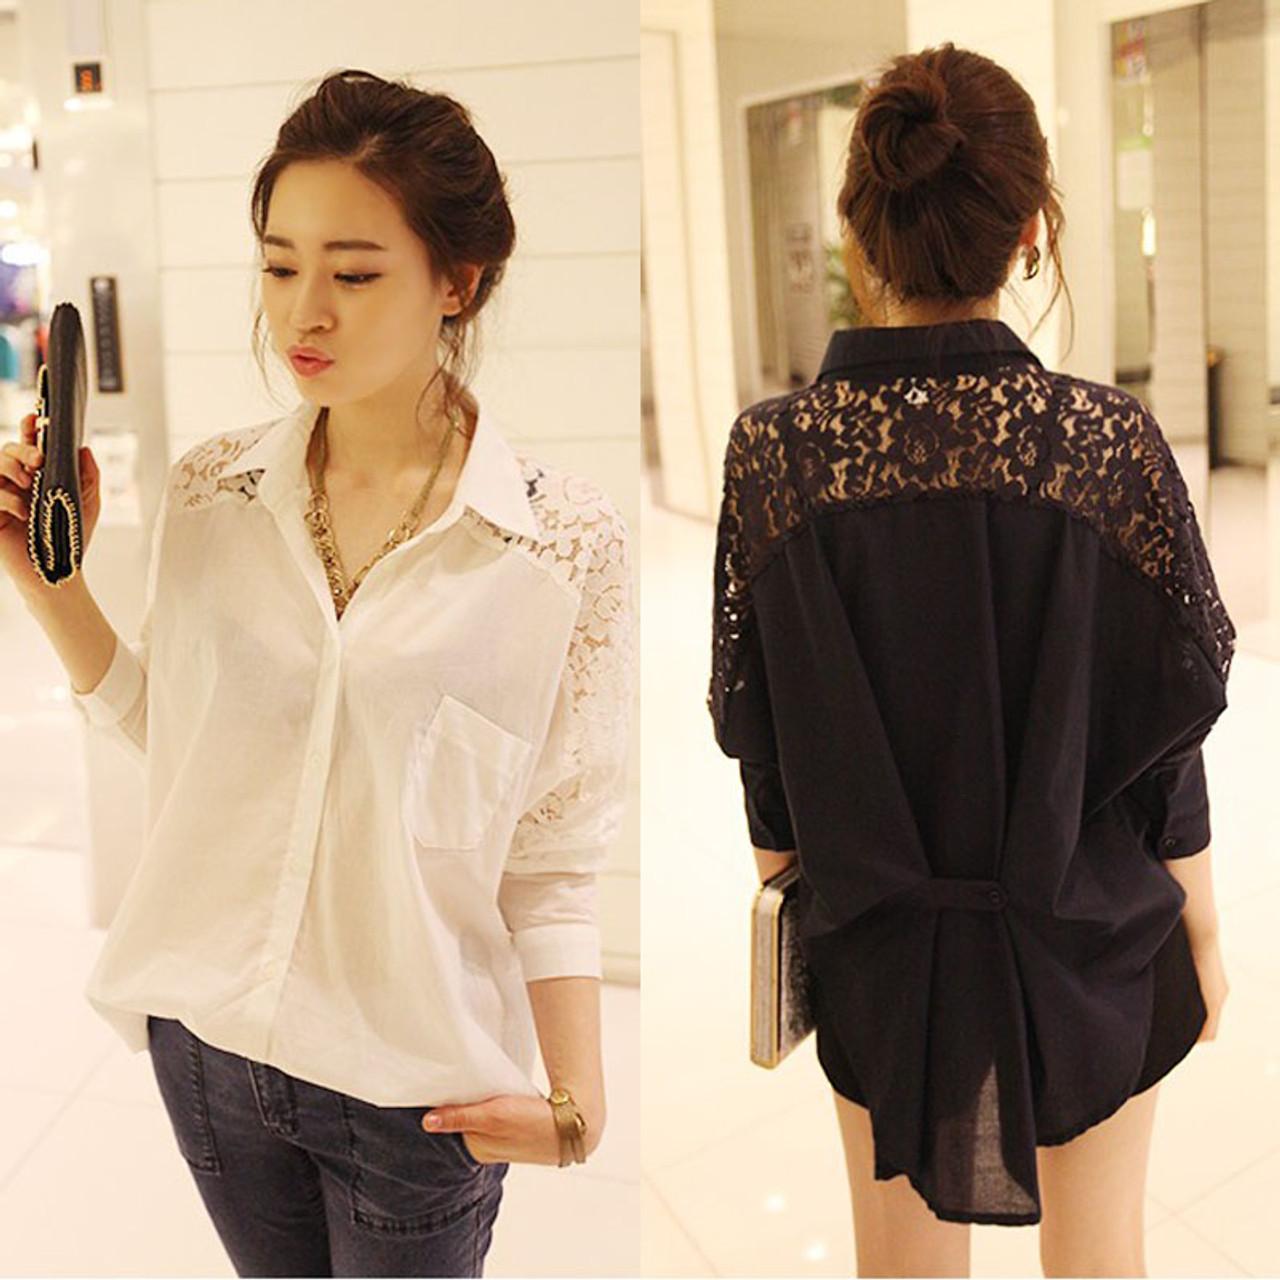 ad316a79a39 long sleeve black white plus size ladies tops Fashion women blouses 2019  hollow .